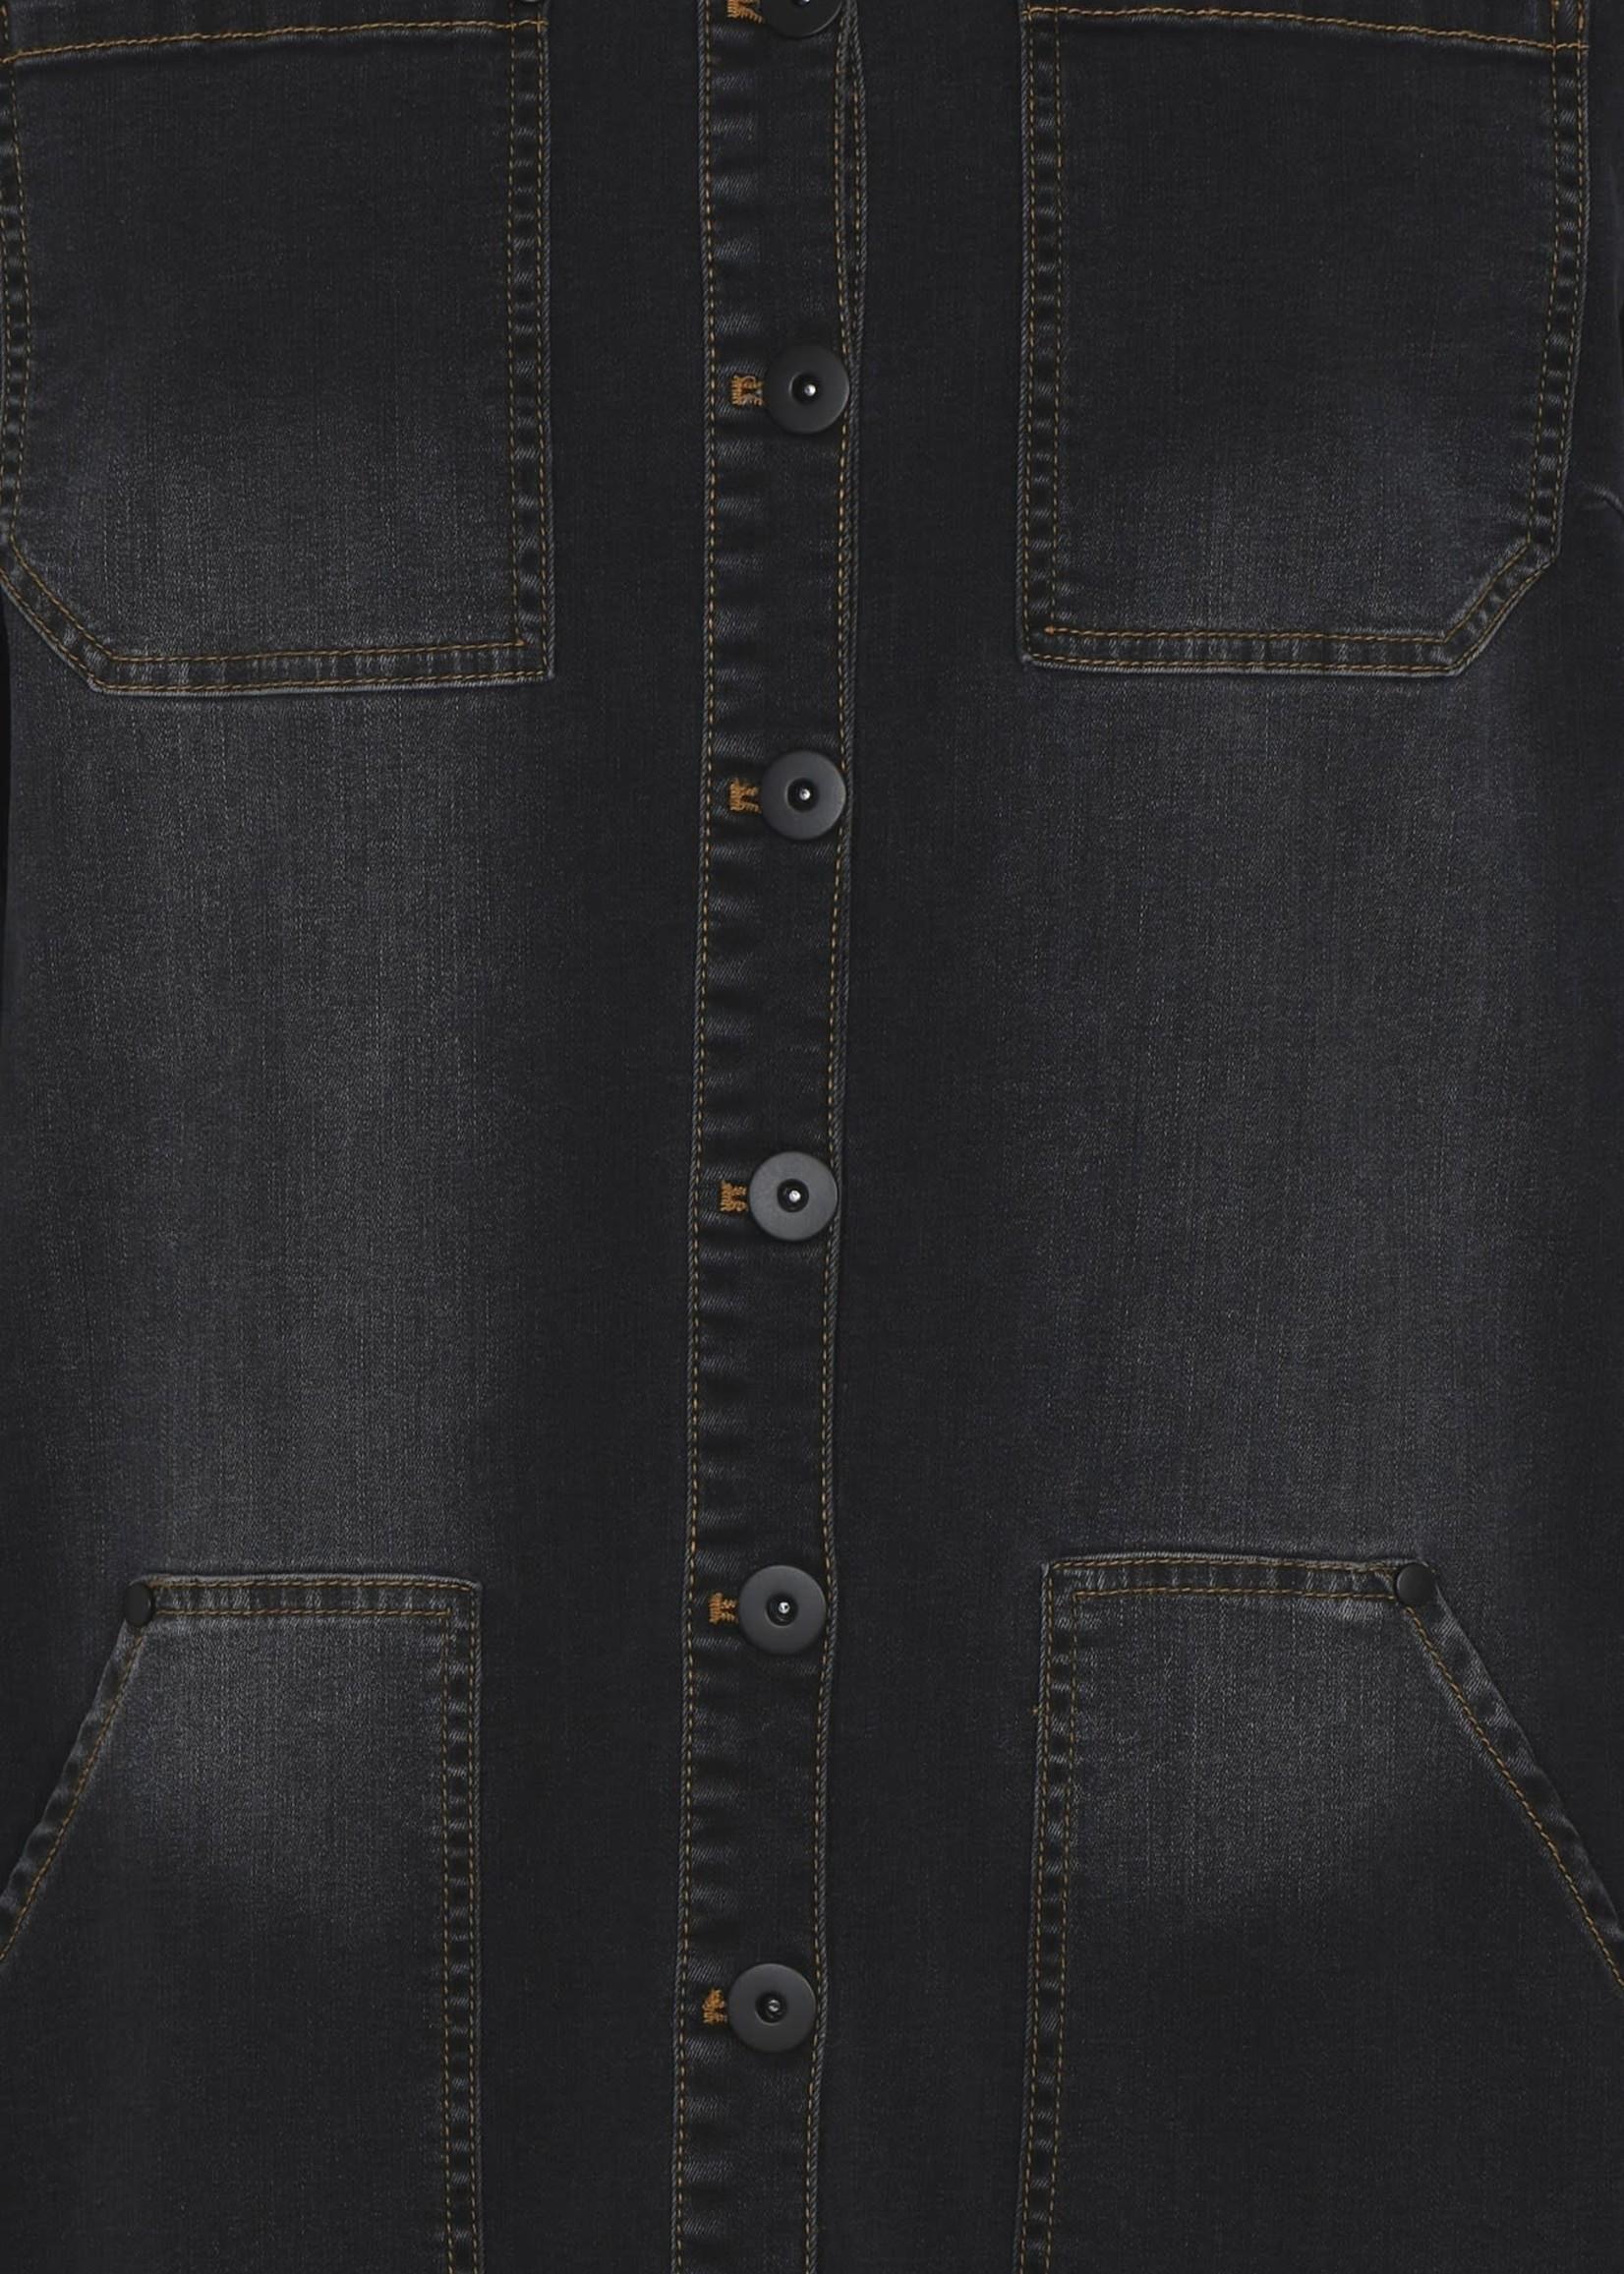 QUE QUE Tuniek jeans met stikseldetails